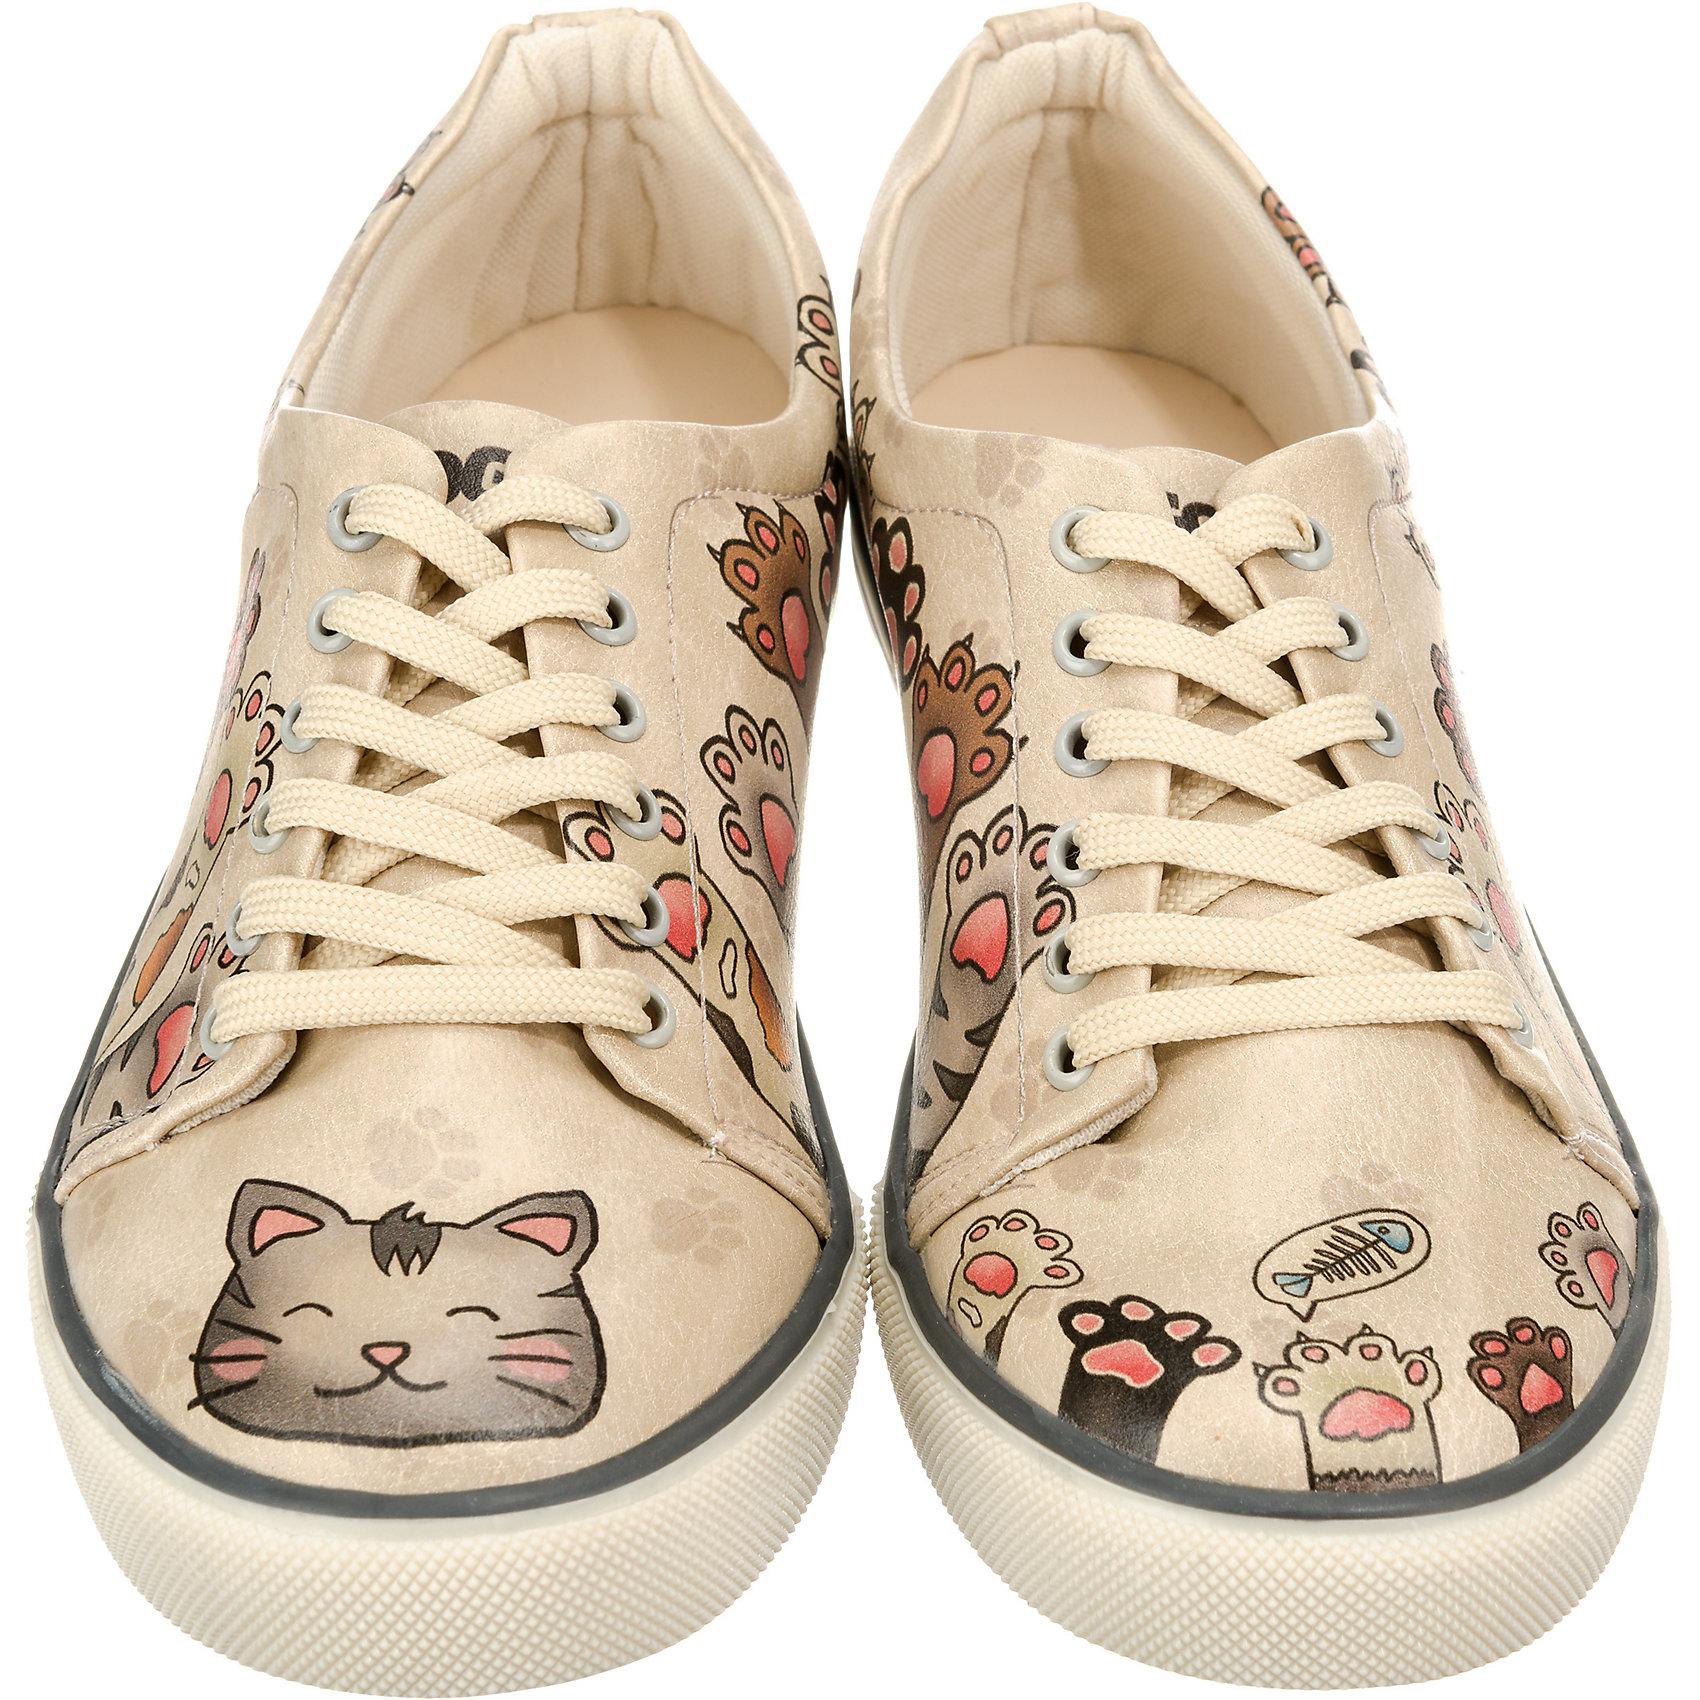 DOGO Sneaker - Yummy 38